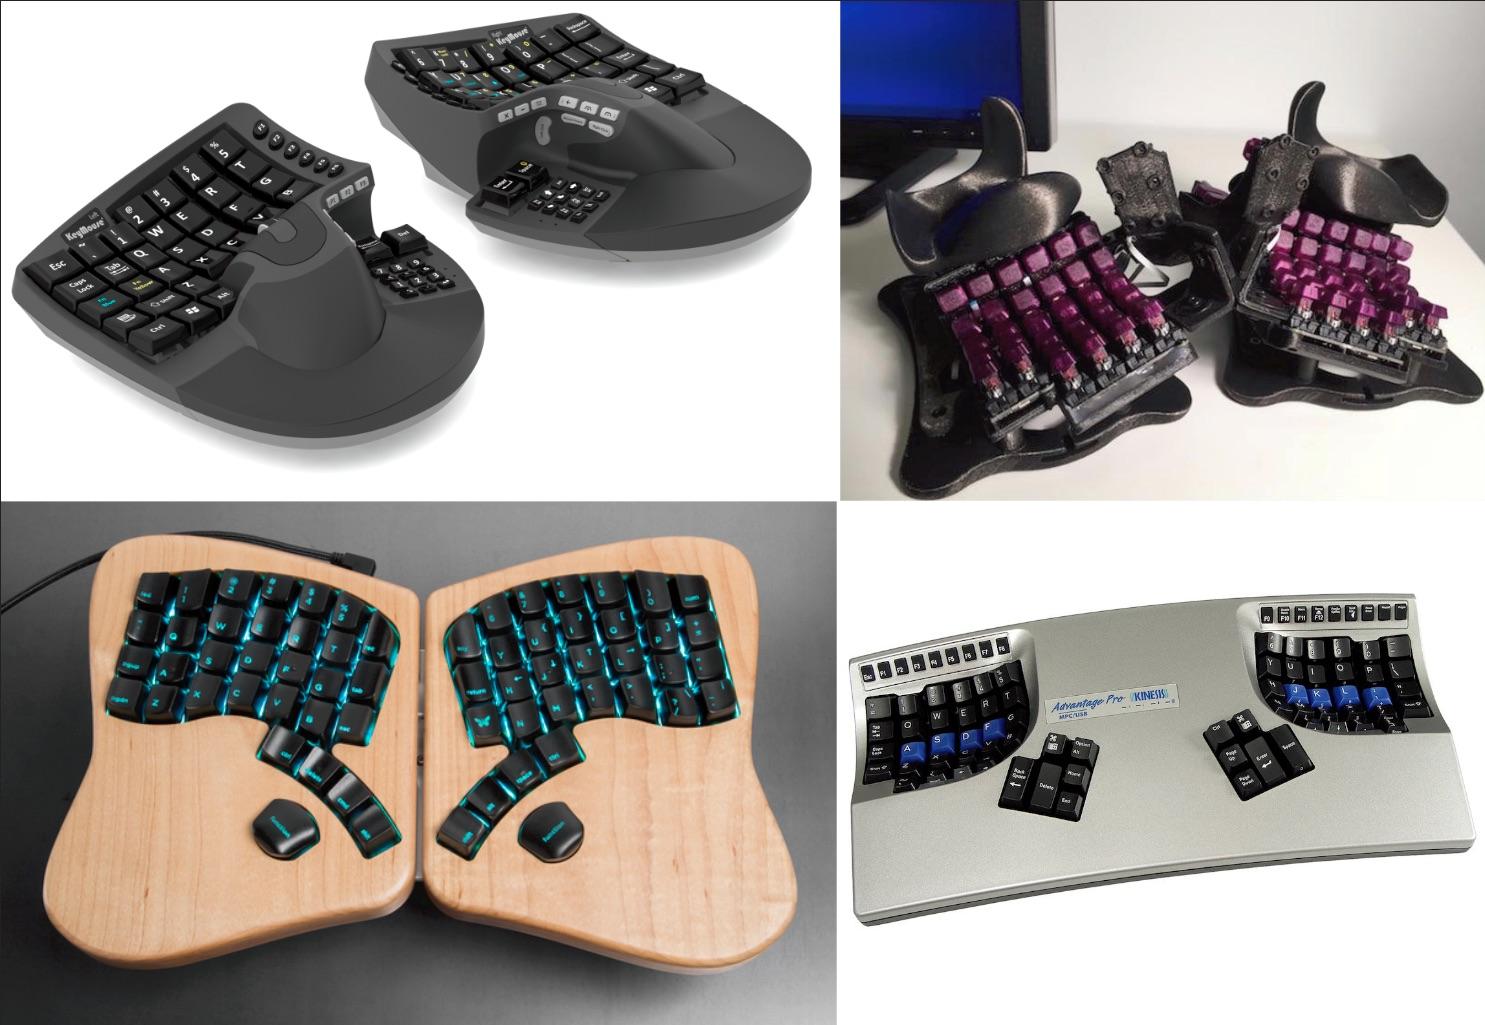 4 keyboards